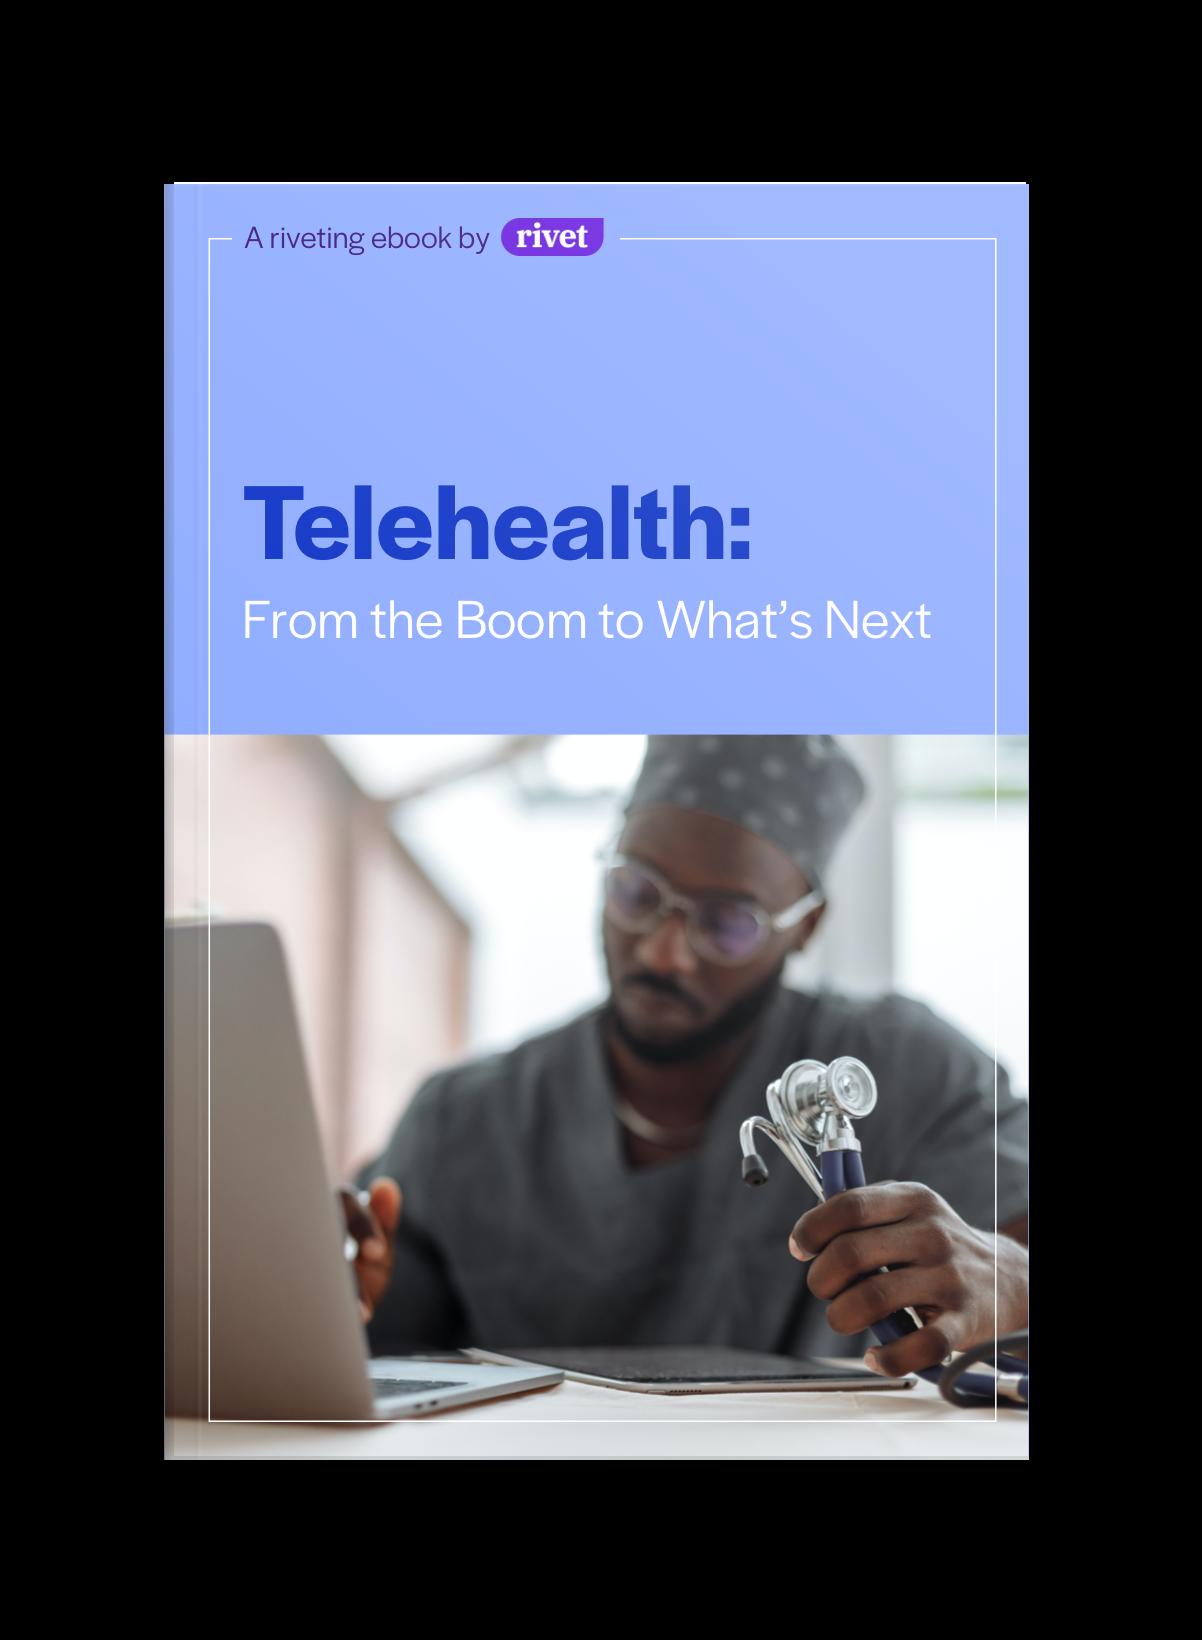 Telehealth: